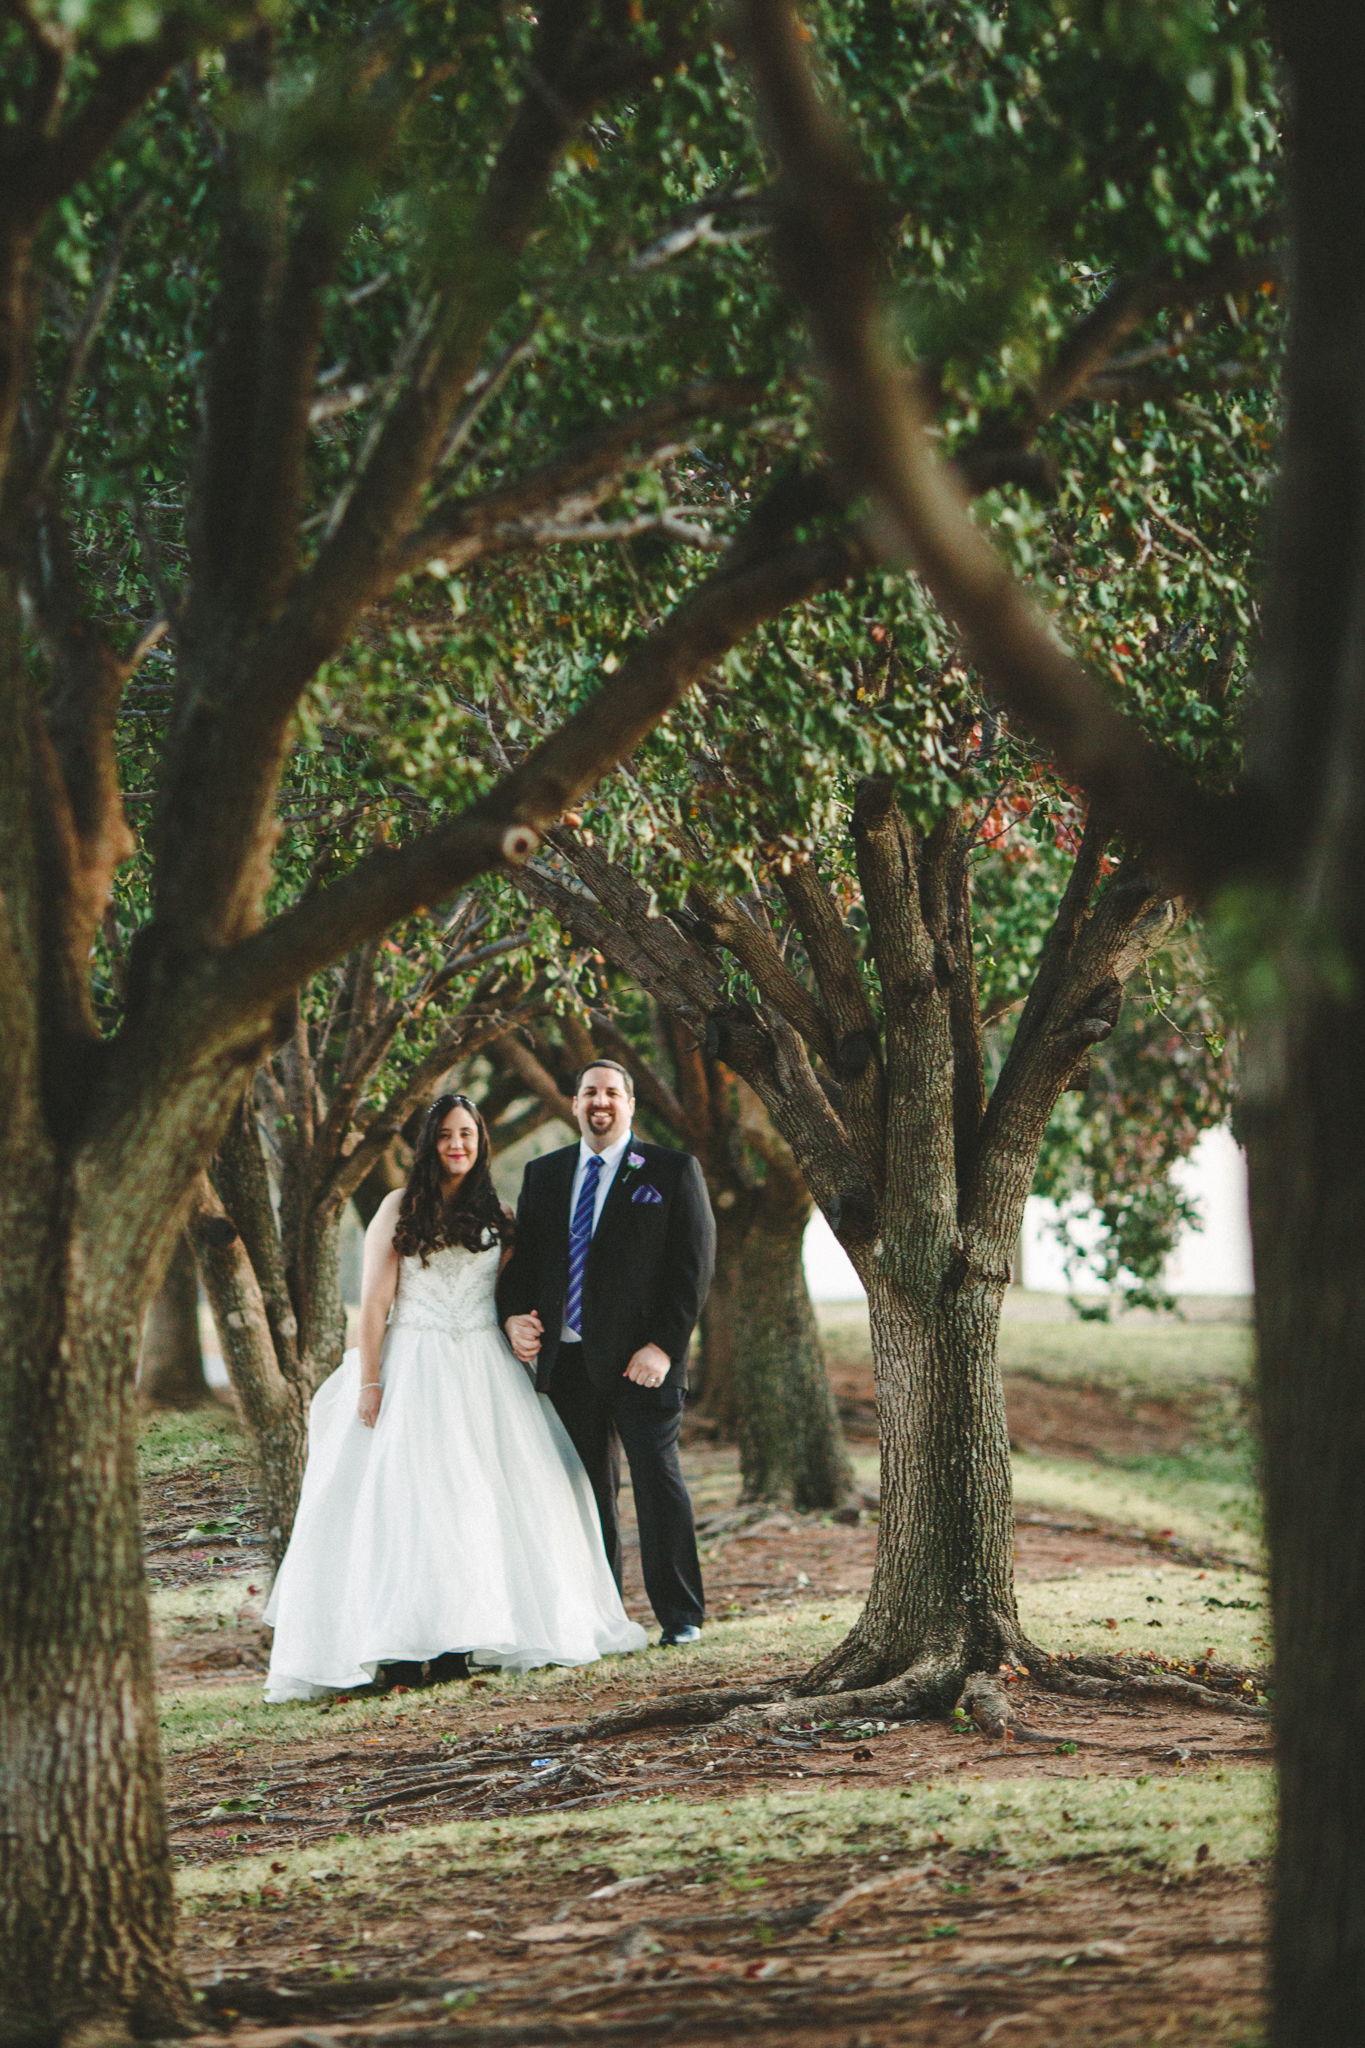 rs bride groom creative portrait among tress greenery oklahoma city